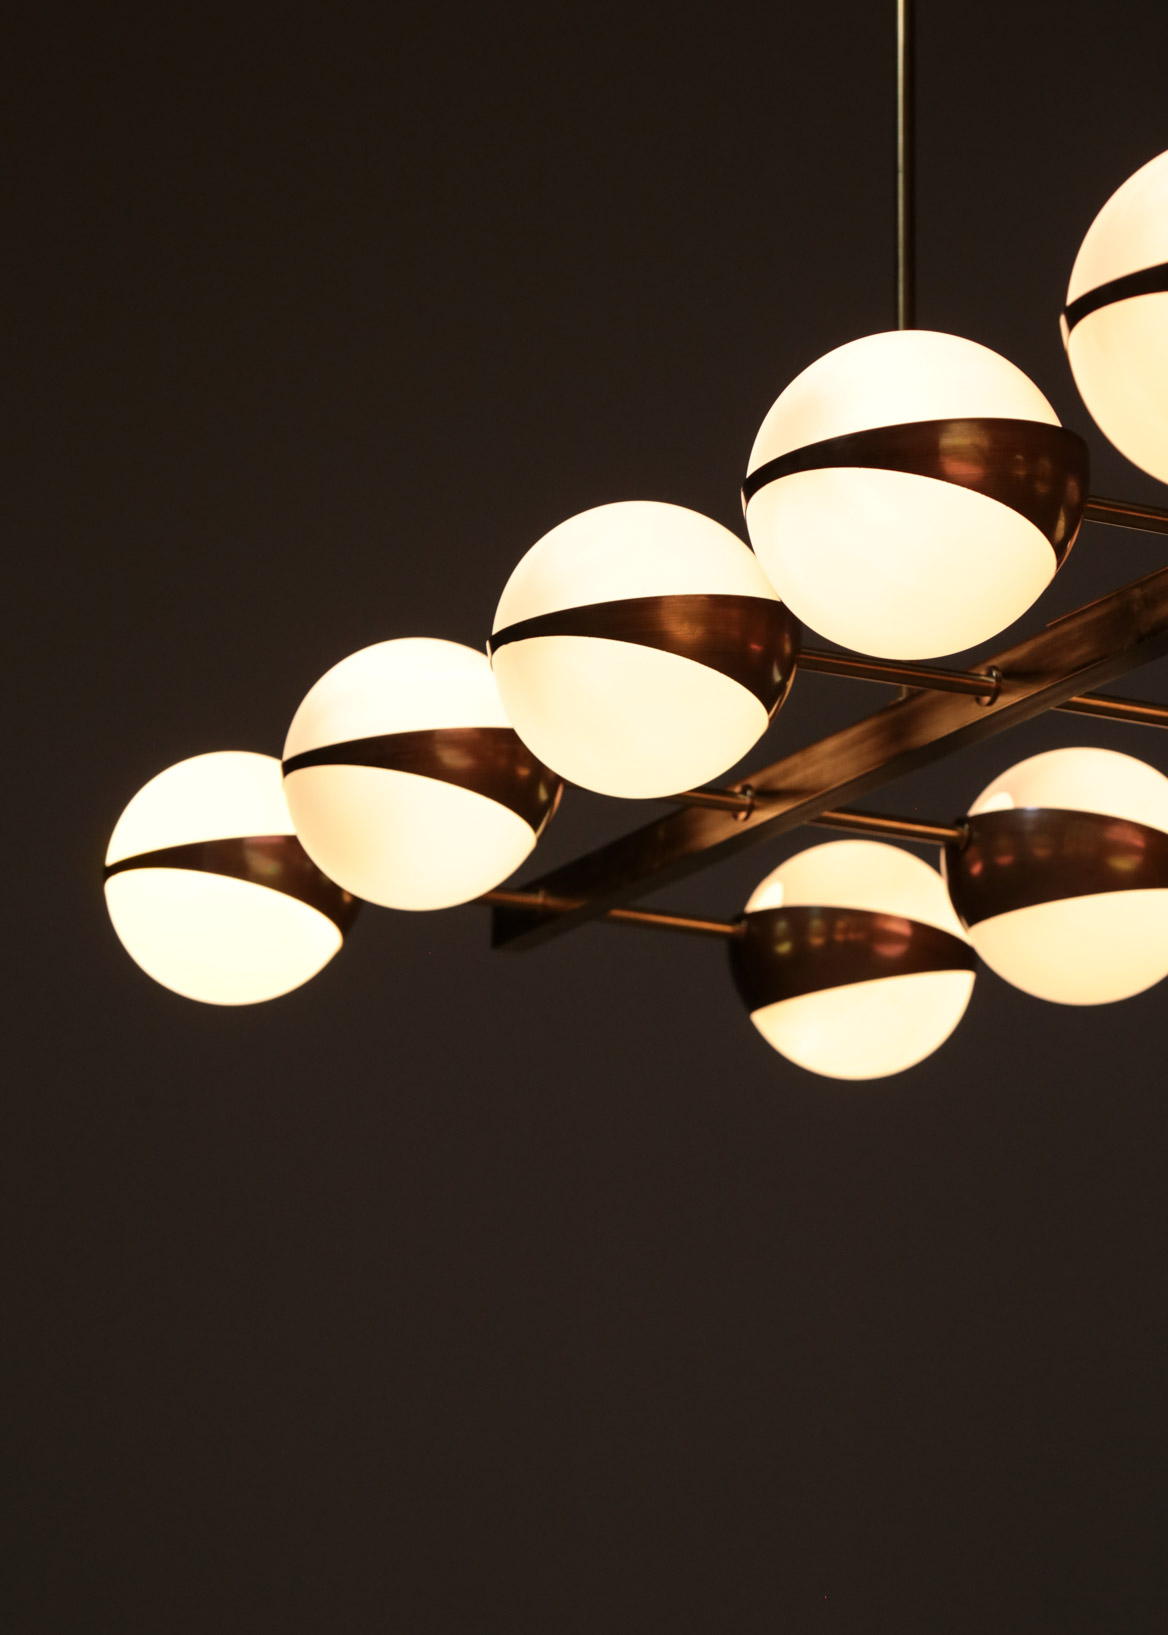 grand lustre contemporain italien 12 opalines style stilnovo danke galerie. Black Bedroom Furniture Sets. Home Design Ideas